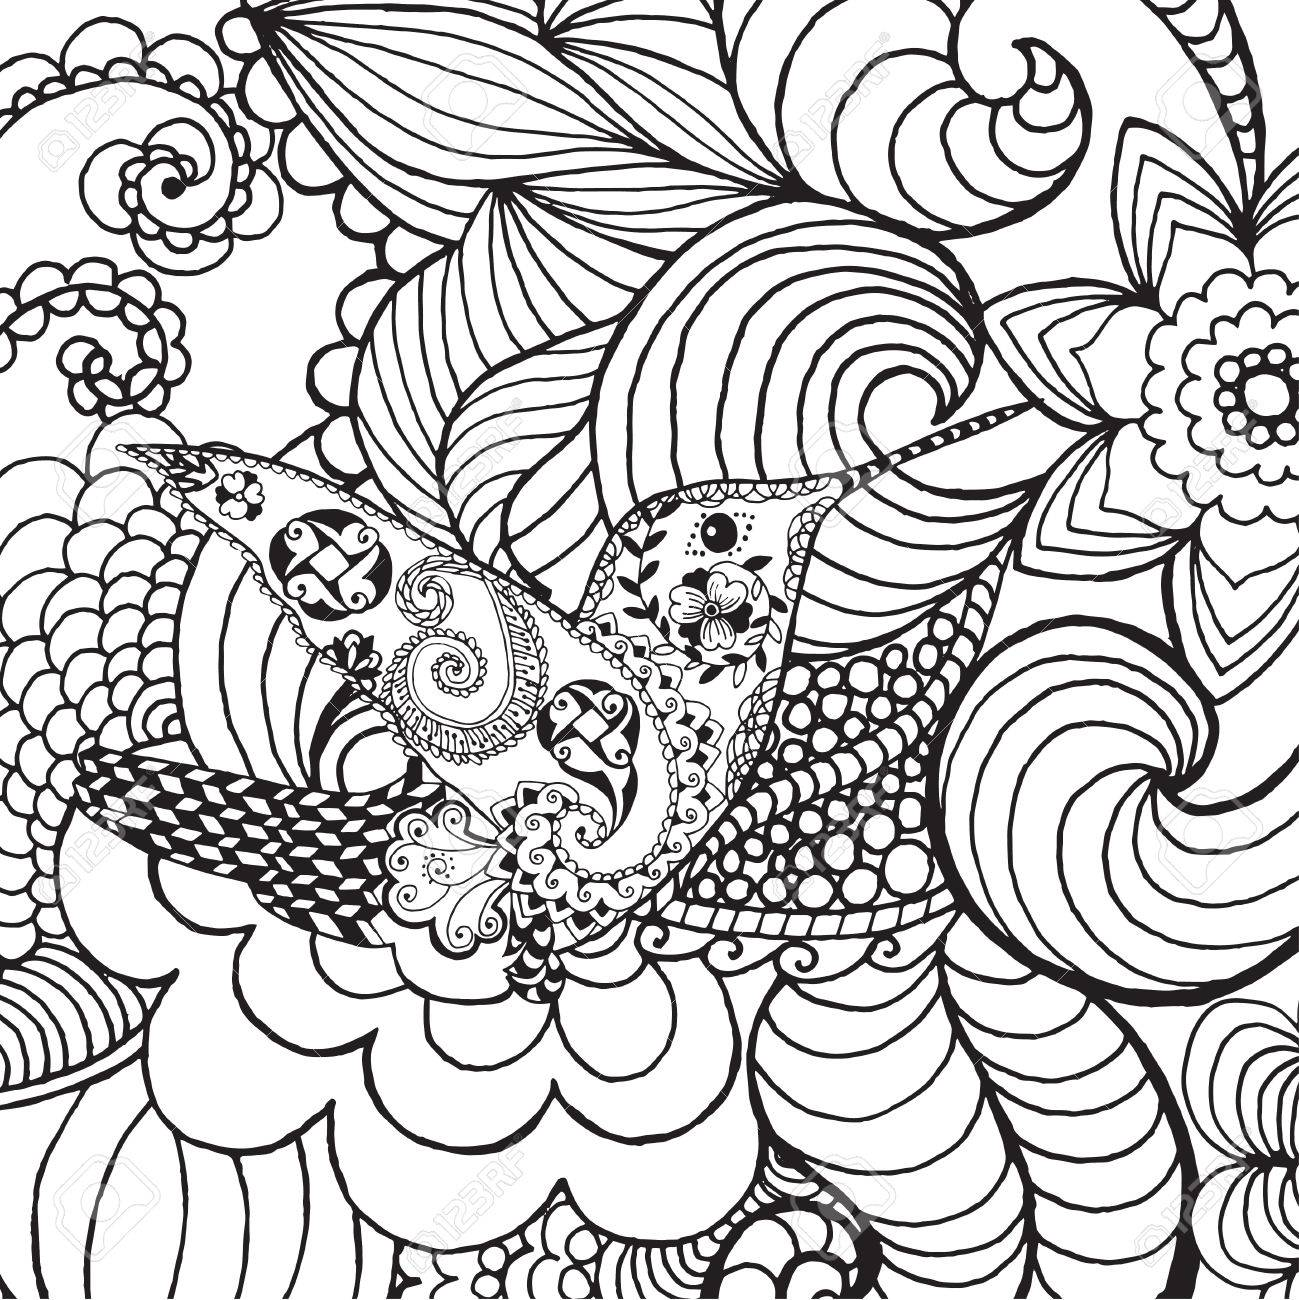 Interesting 57055401 Hummingbird Fantasy Garden Animals Hand Drawn Doodle Ethnic Patterned Illustration African Indian Fantasy Garden Design garden Fantasy Garden Designs